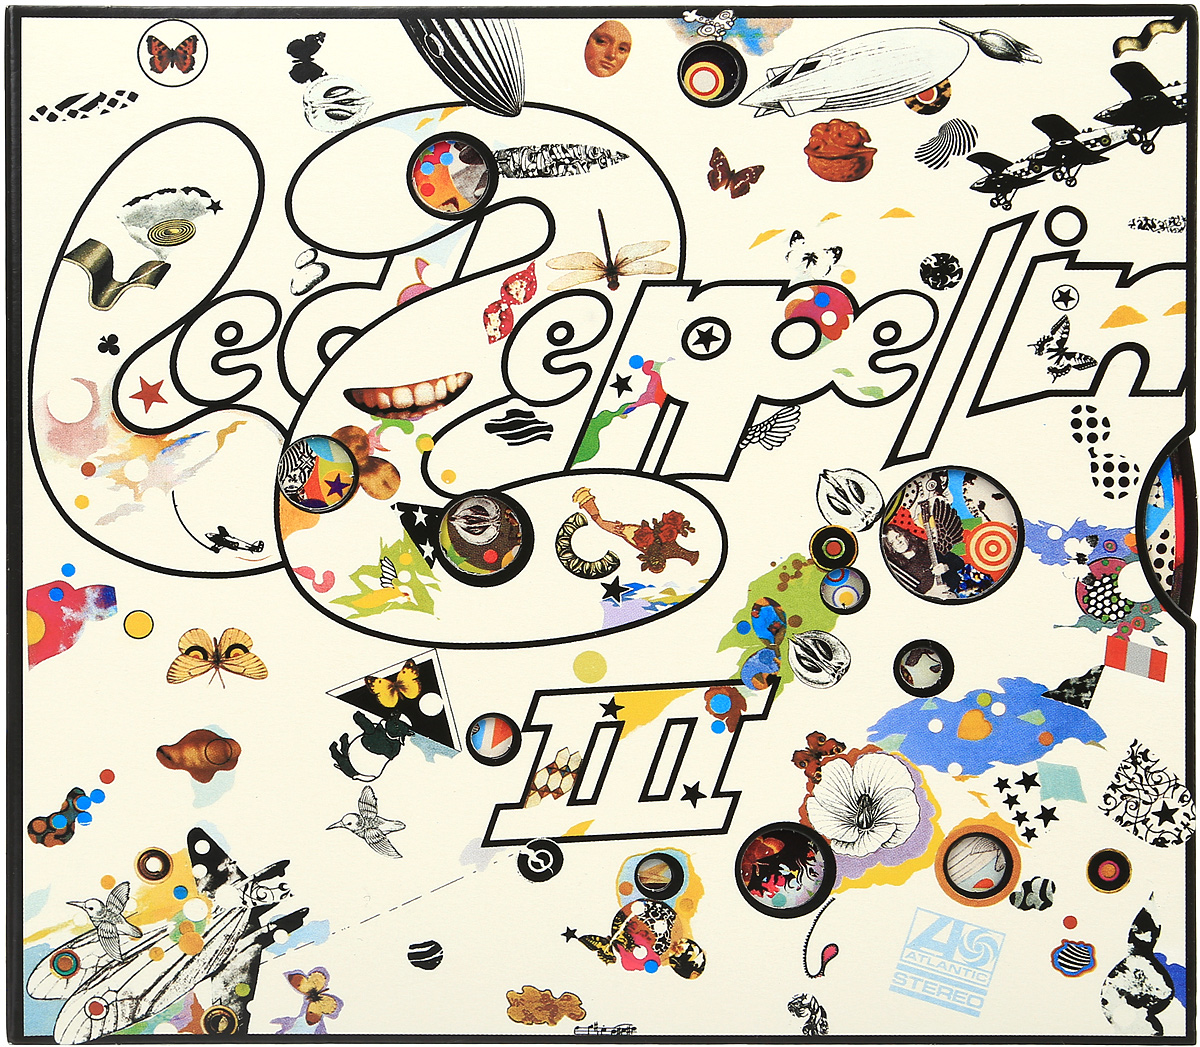 Led Zeppelin Led Zeppelin. Led Zeppelin III led zeppelin led zeppelin led zeppelin iii 2 cd